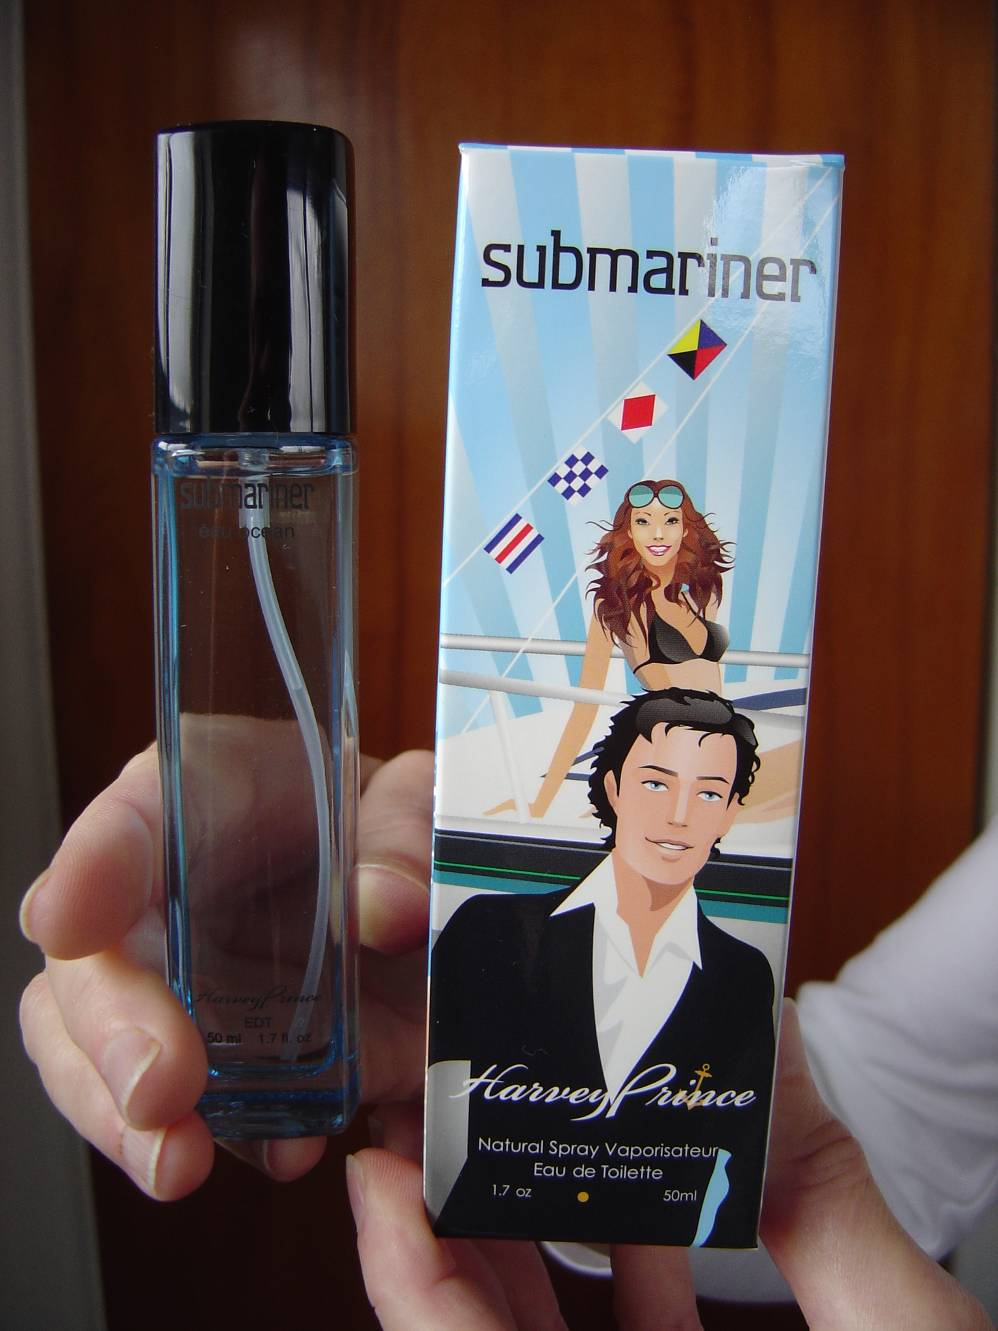 Harvey Prince Submariner fragrance.jpeg